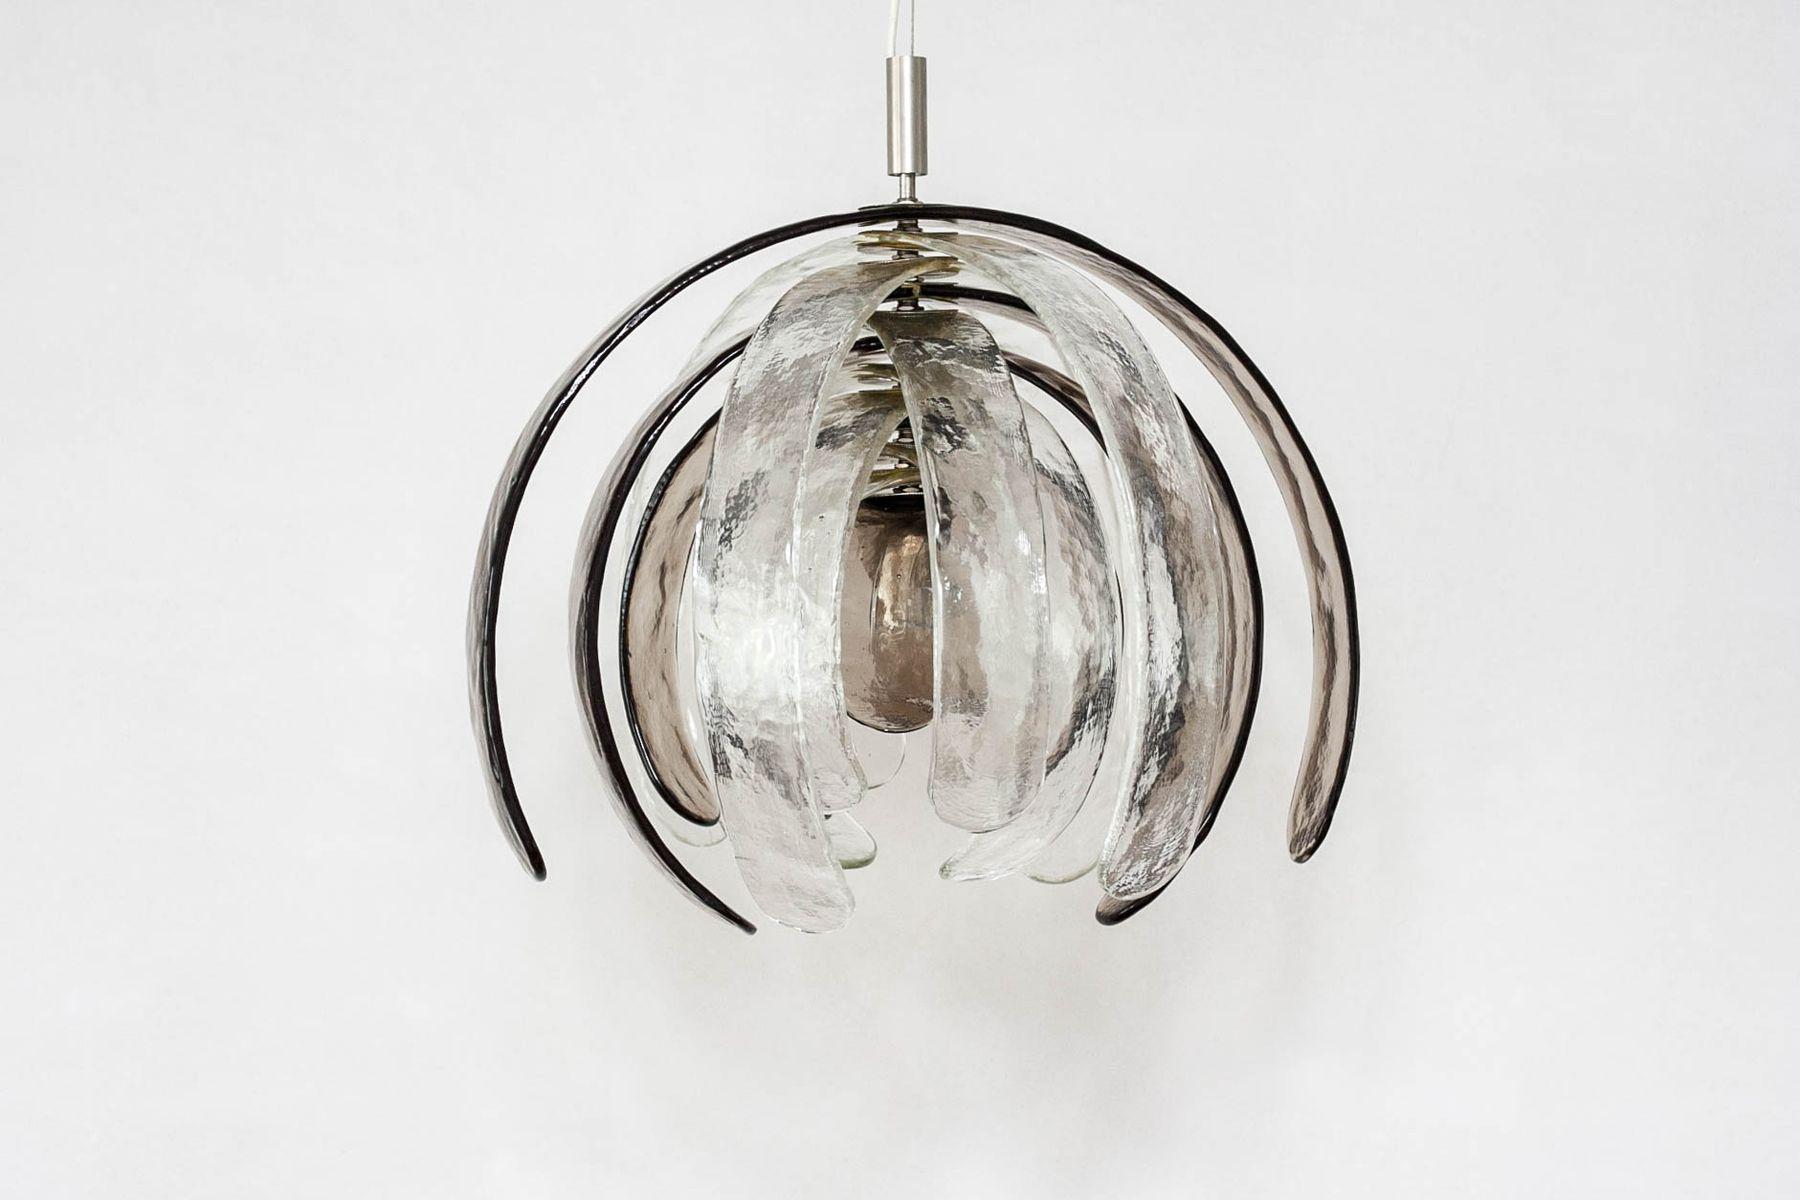 italian pendant lighting. midcentury italian artichoke pendant light by carlo nason for mazzega 1960s lighting